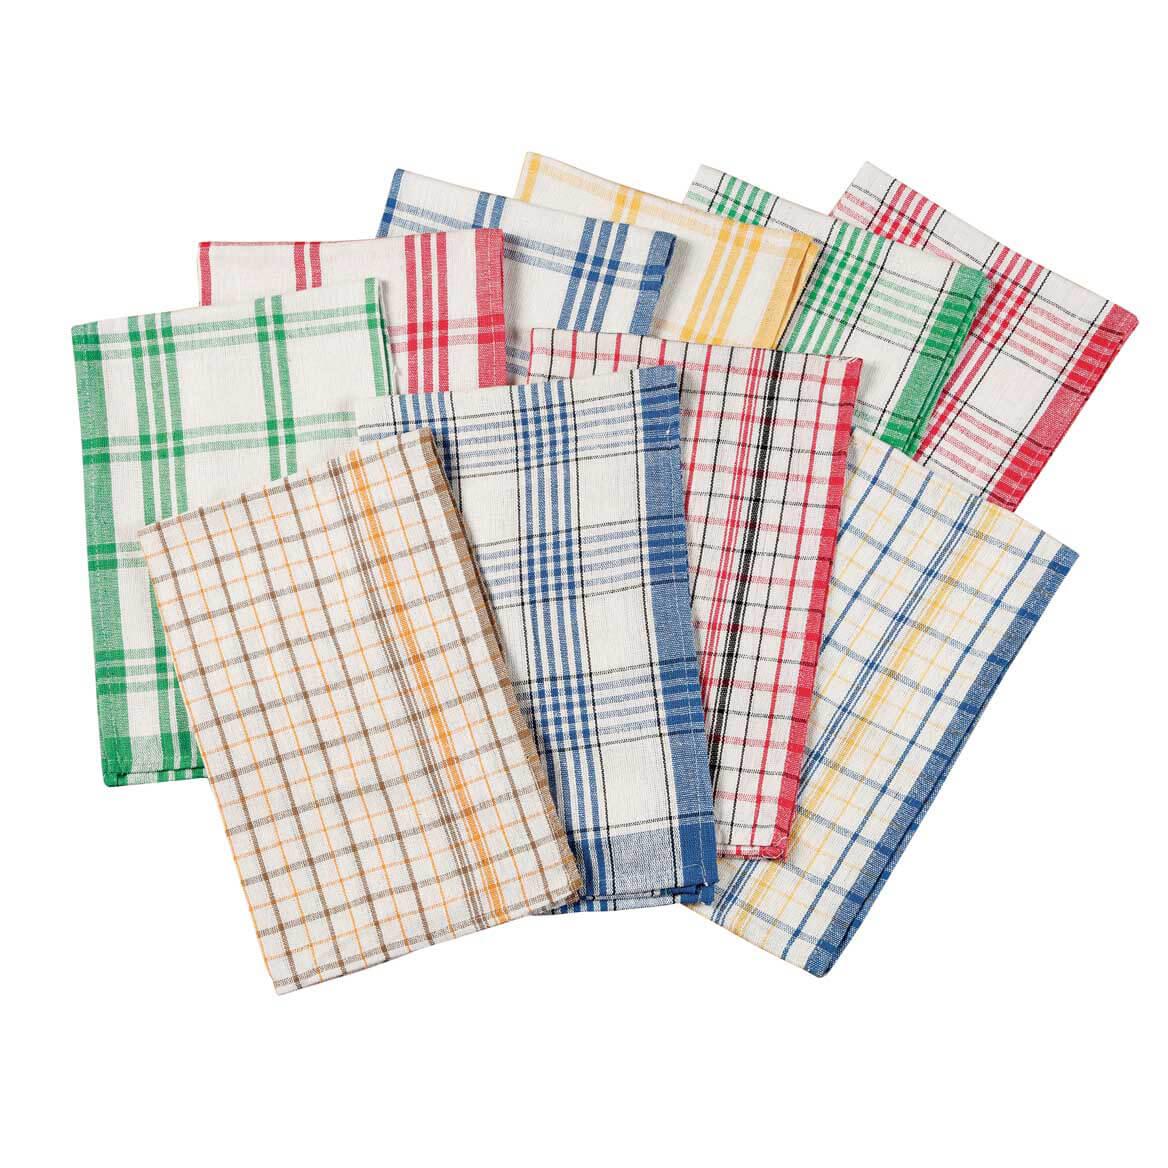 Plaid Kitchen Towels Set of 10  Kitchen Towels  Miles